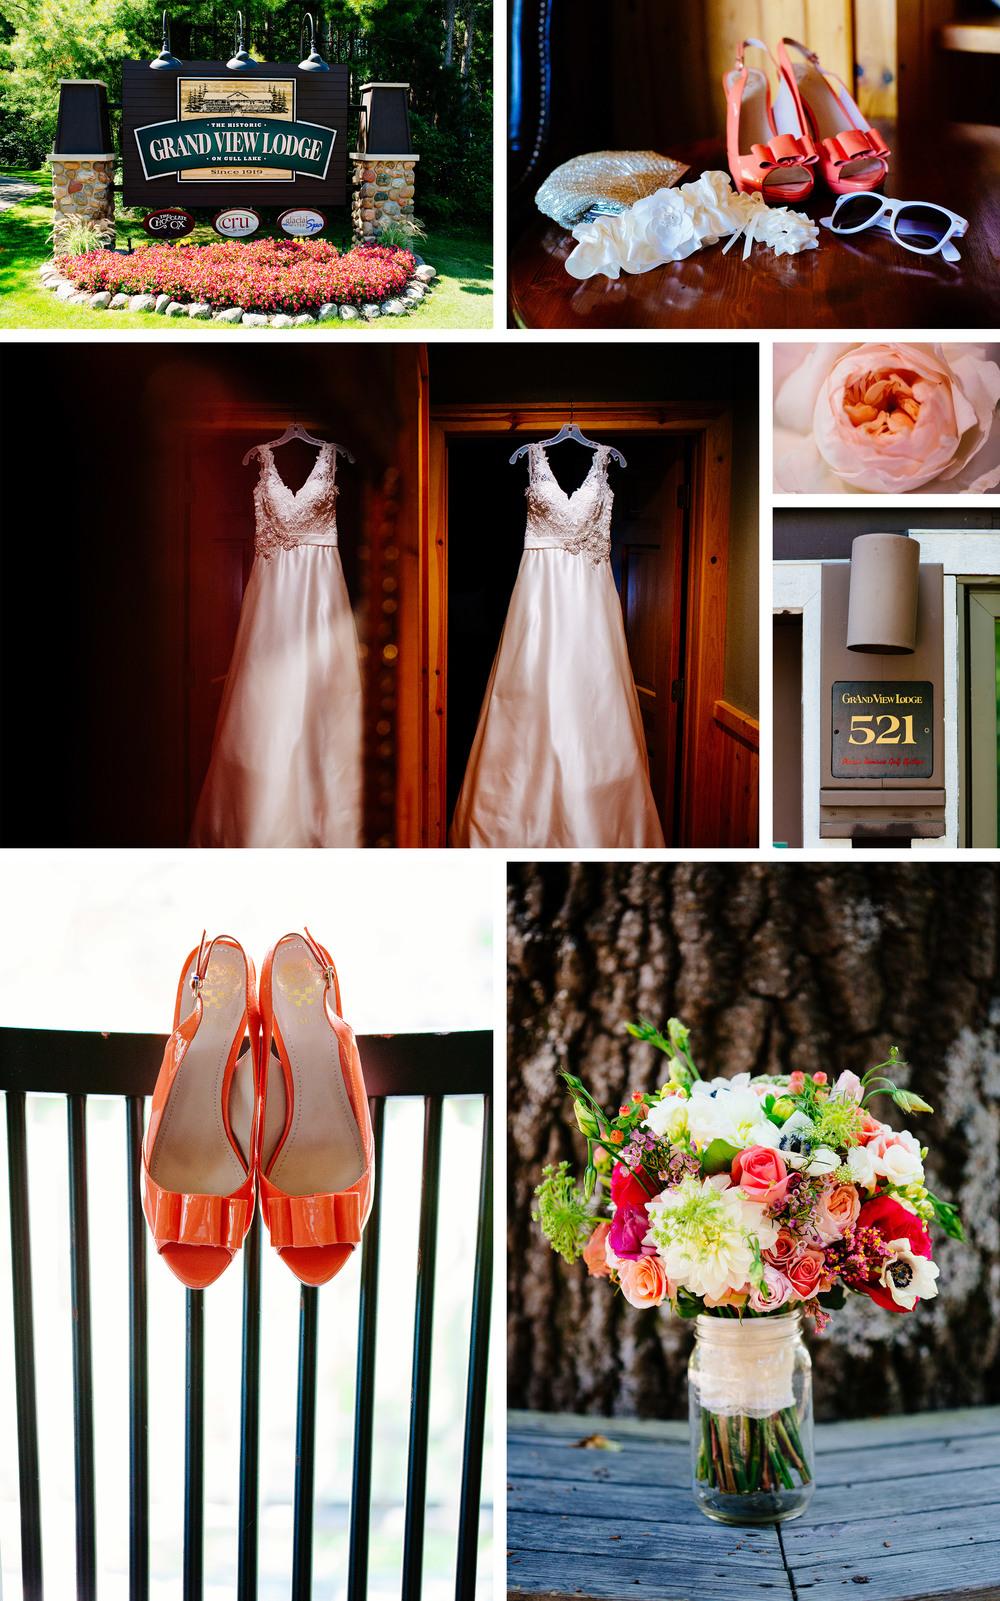 Grandview_Lodge_Wedding_02.jpg